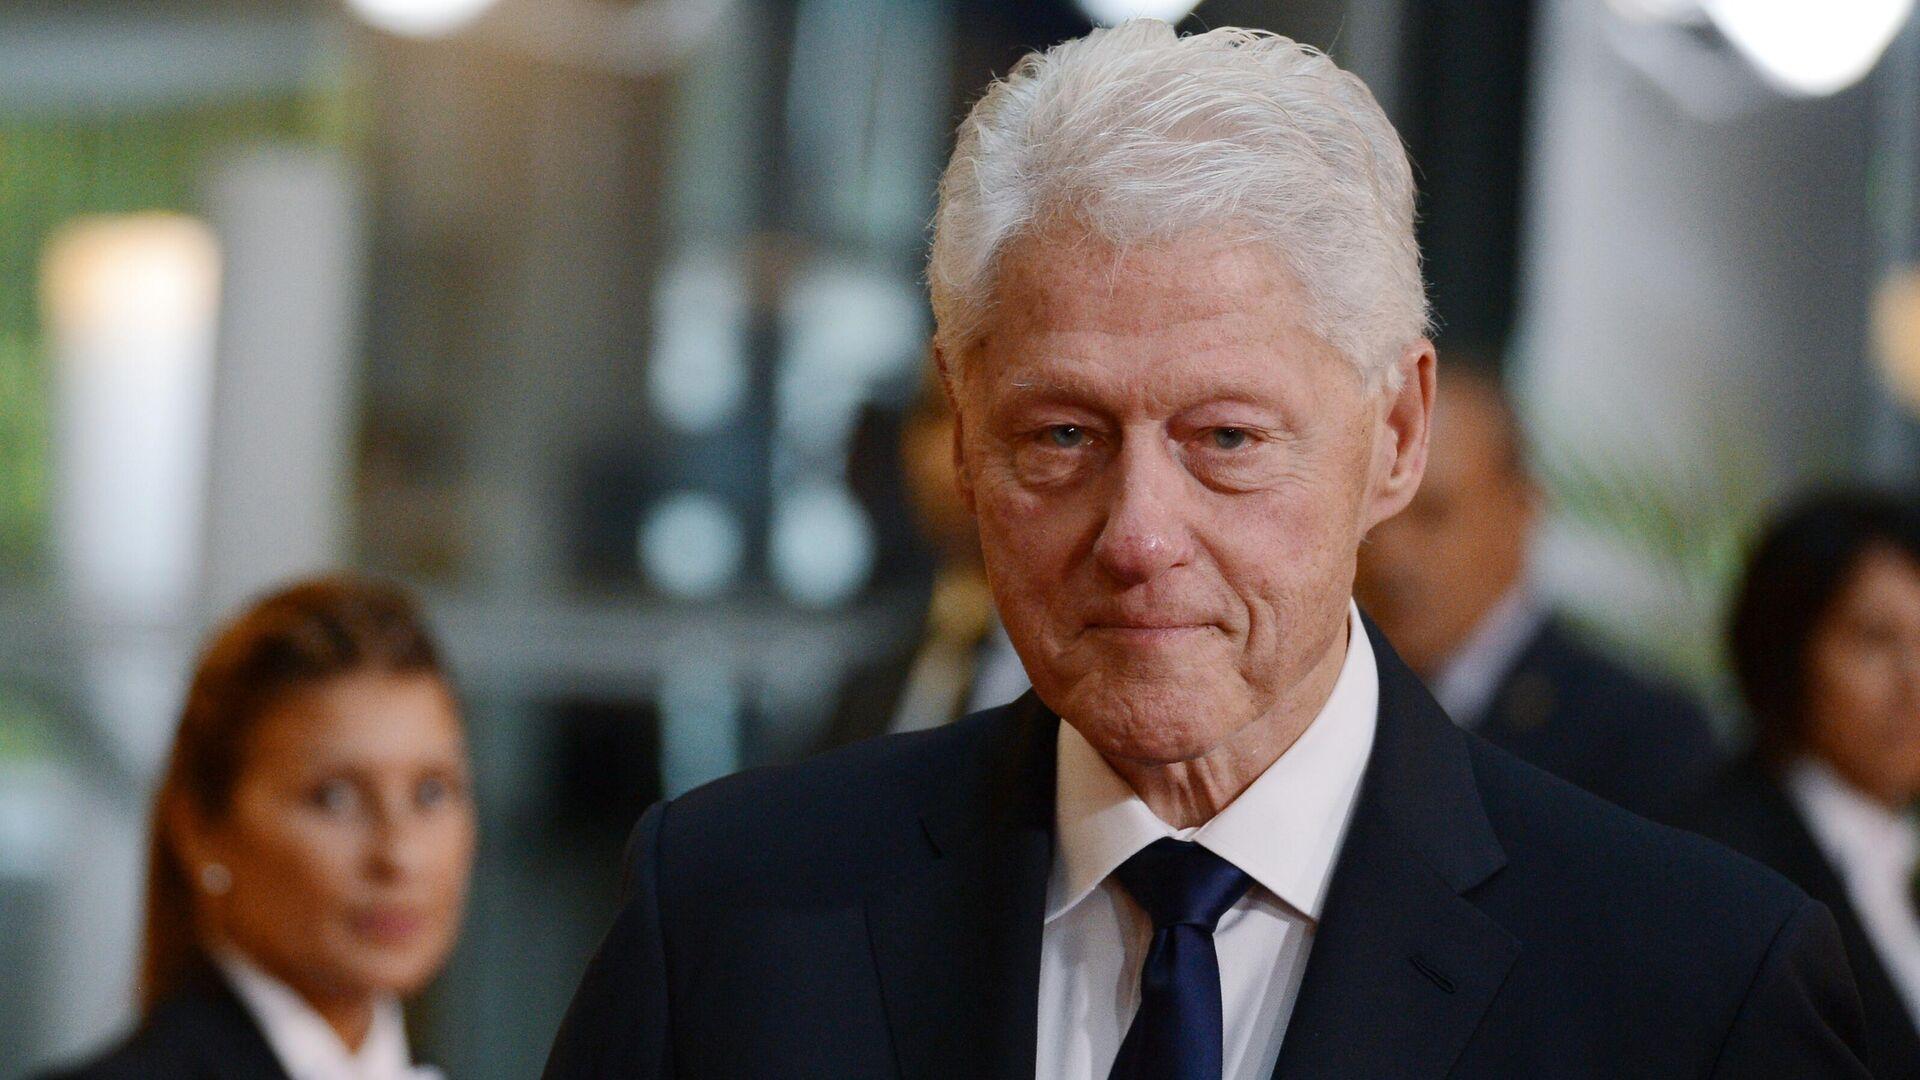 Стала известна причина госпитализации экс-президента США Клинтона